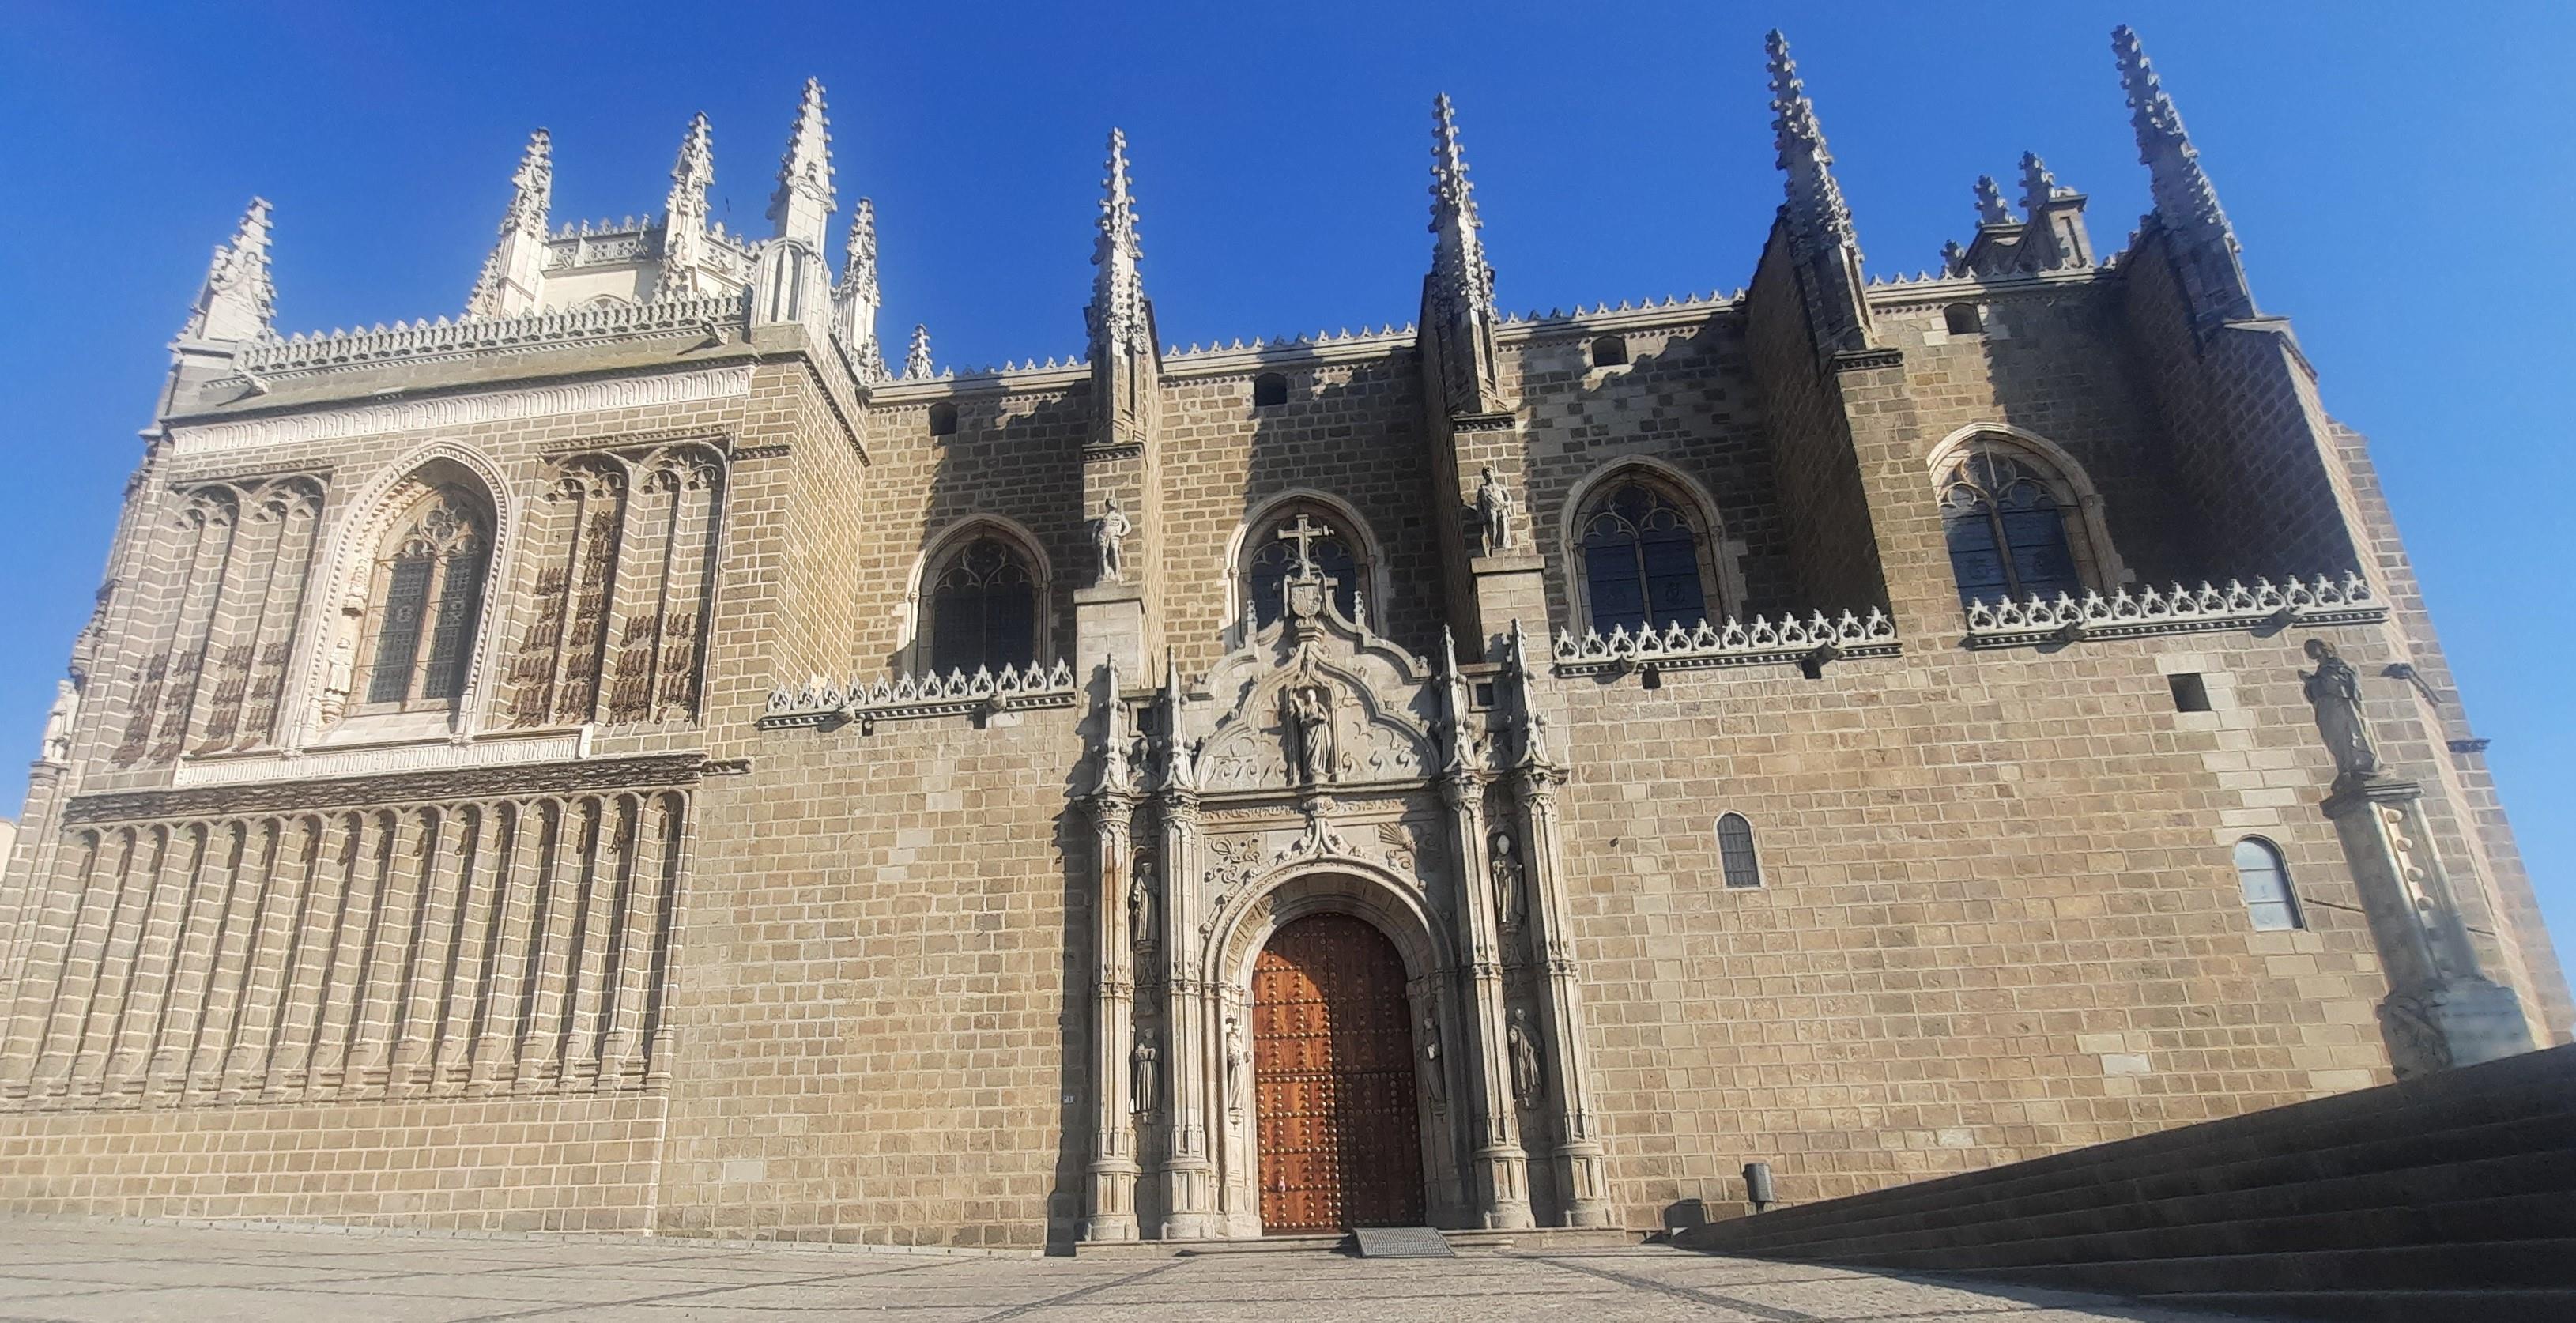 Free-Tour-Descubre-el-Toledo-Historico-14